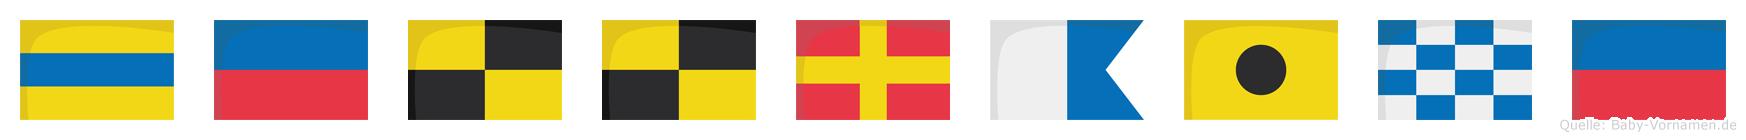 Dellraine im Flaggenalphabet